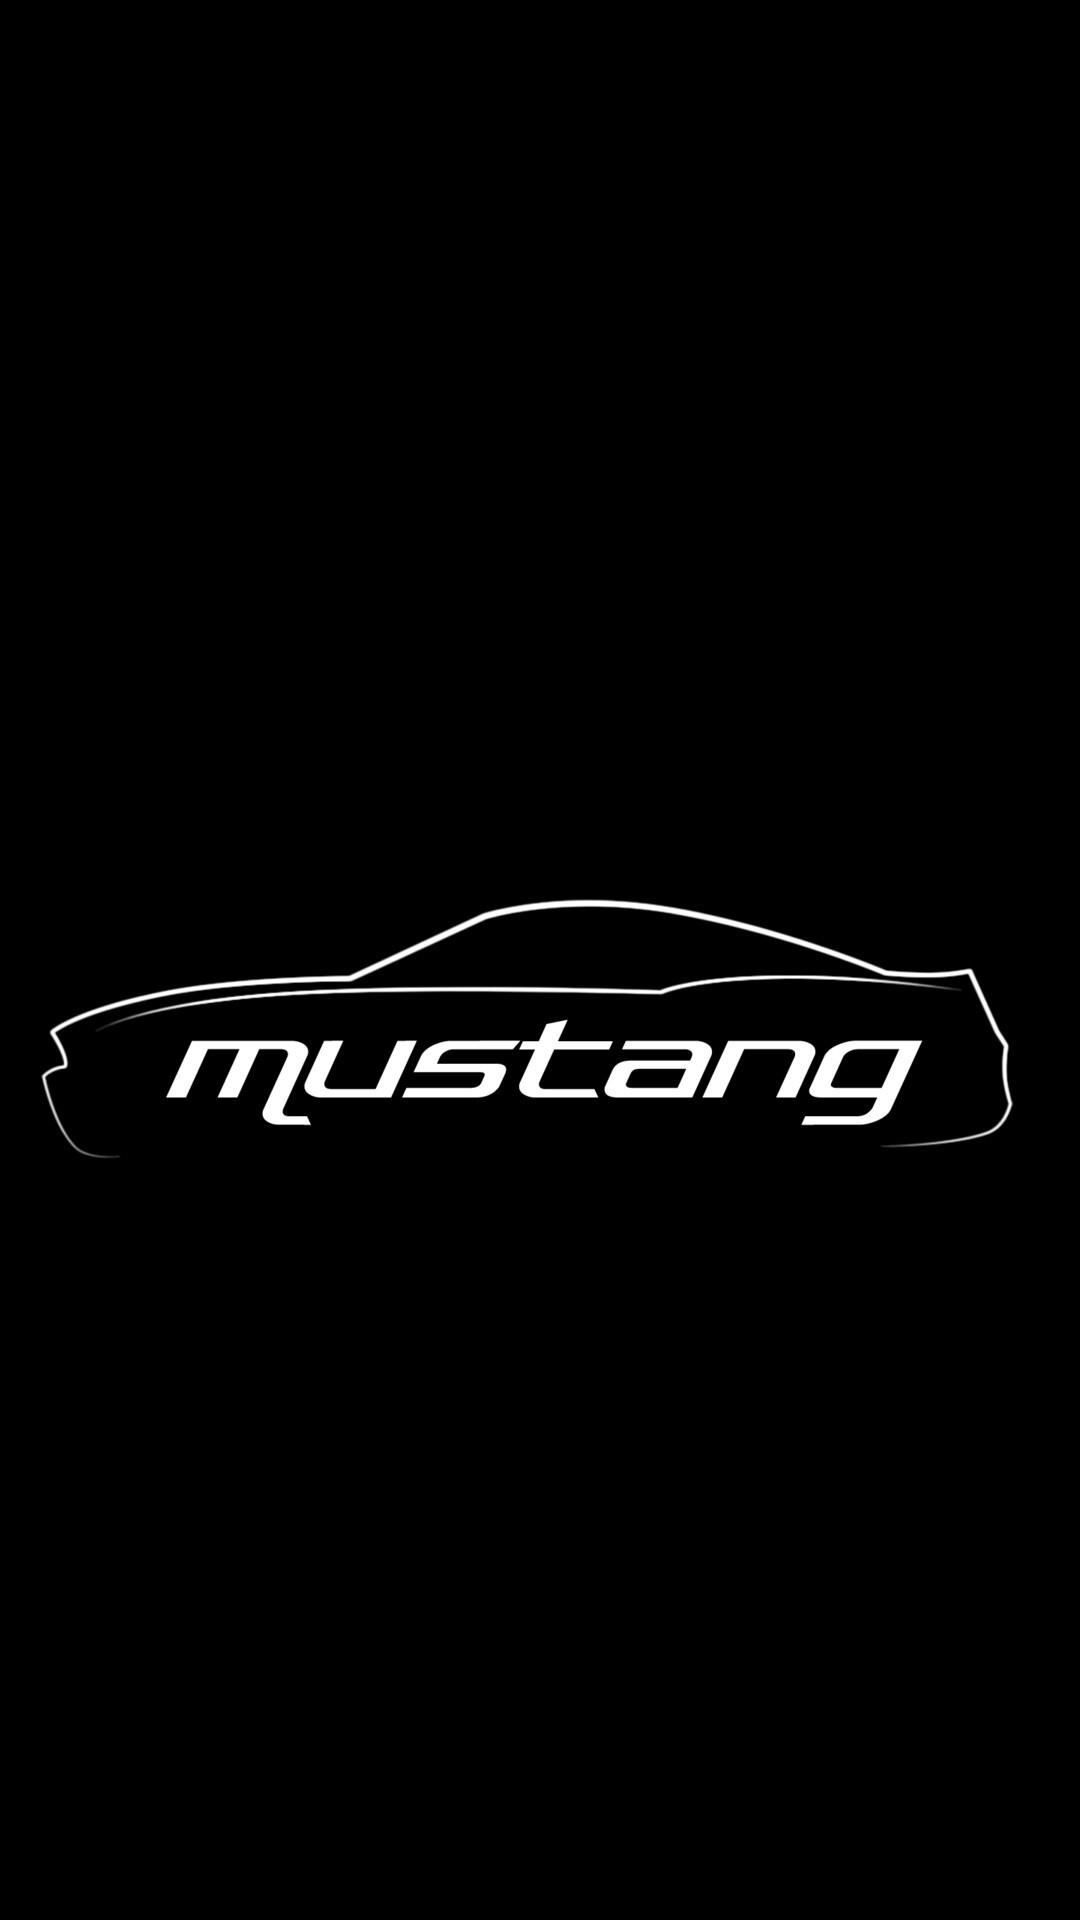 68+ Mustang Logo Wallpapers on WallpaperPlay.